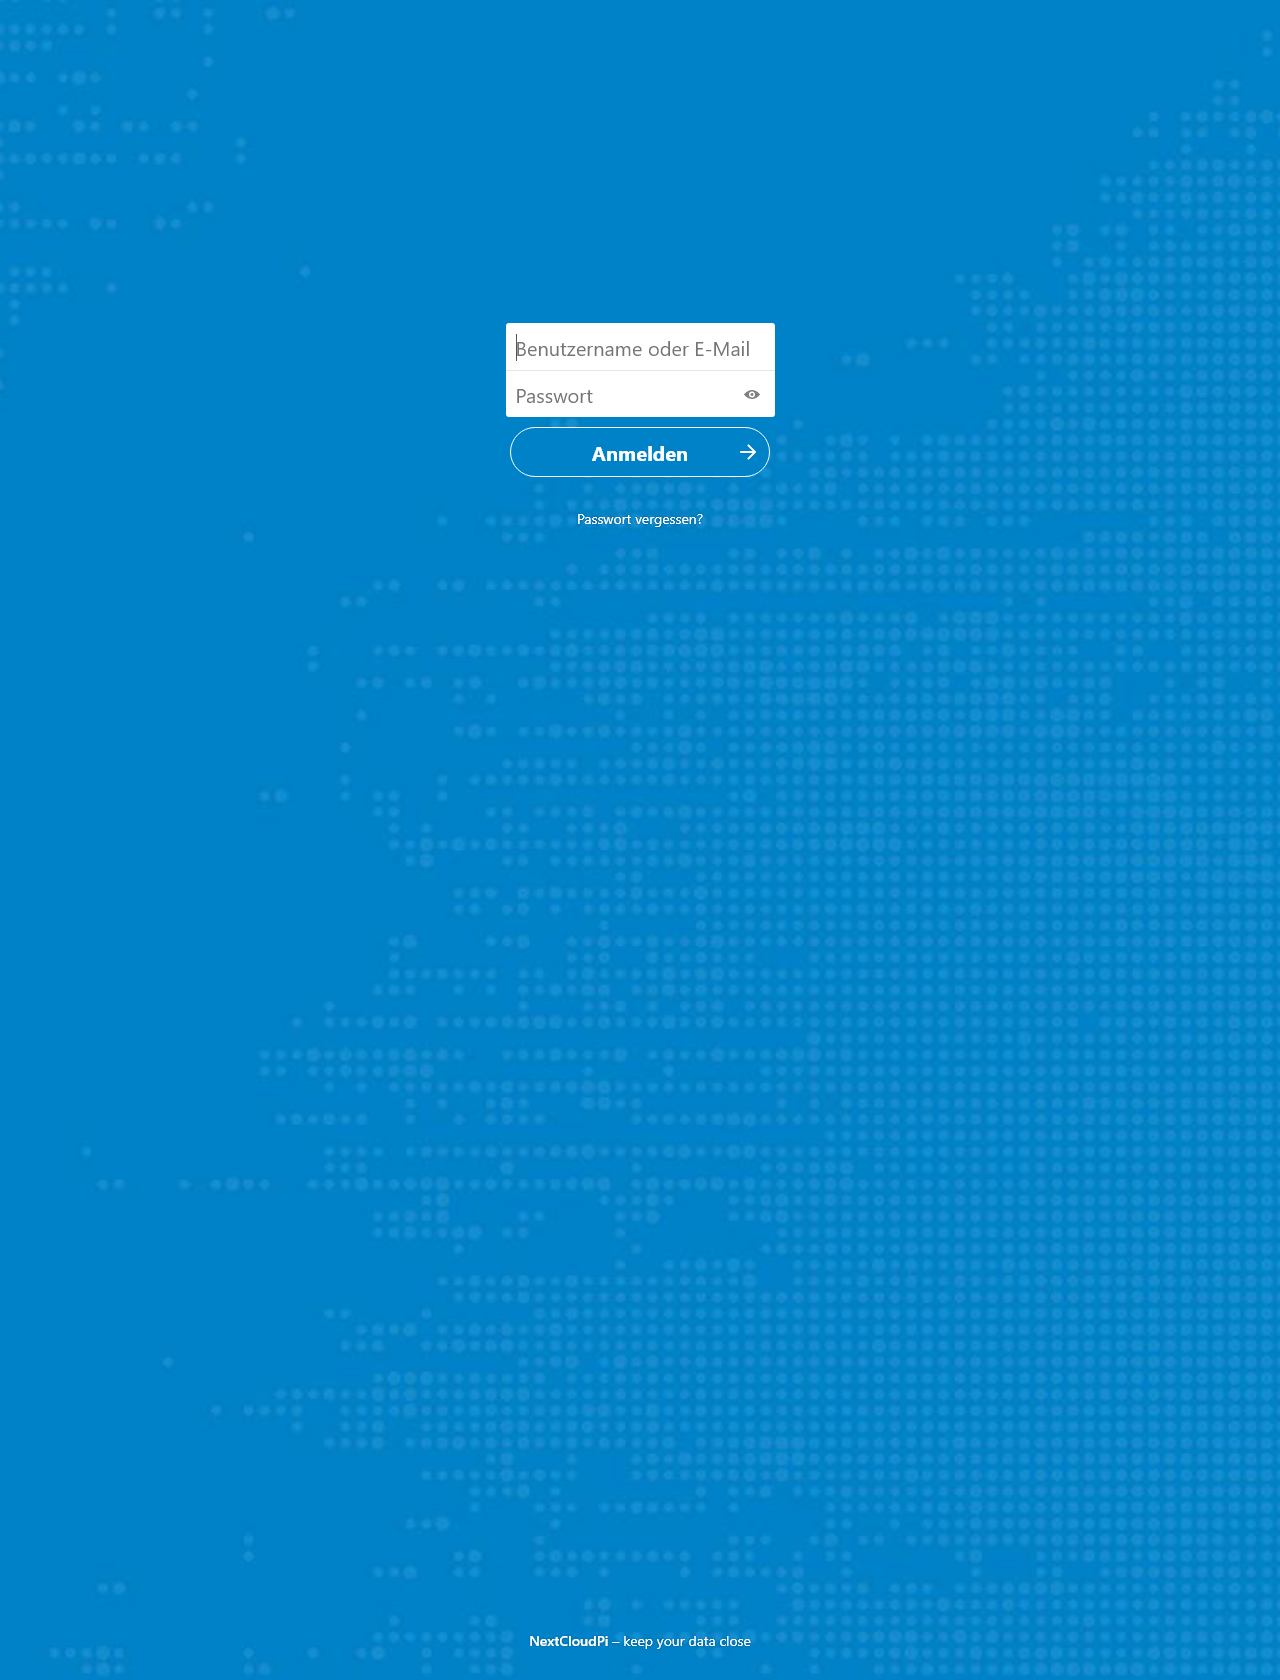 Screenshot Desktop - https://buelowcloud.psybnc.org/index.php/login